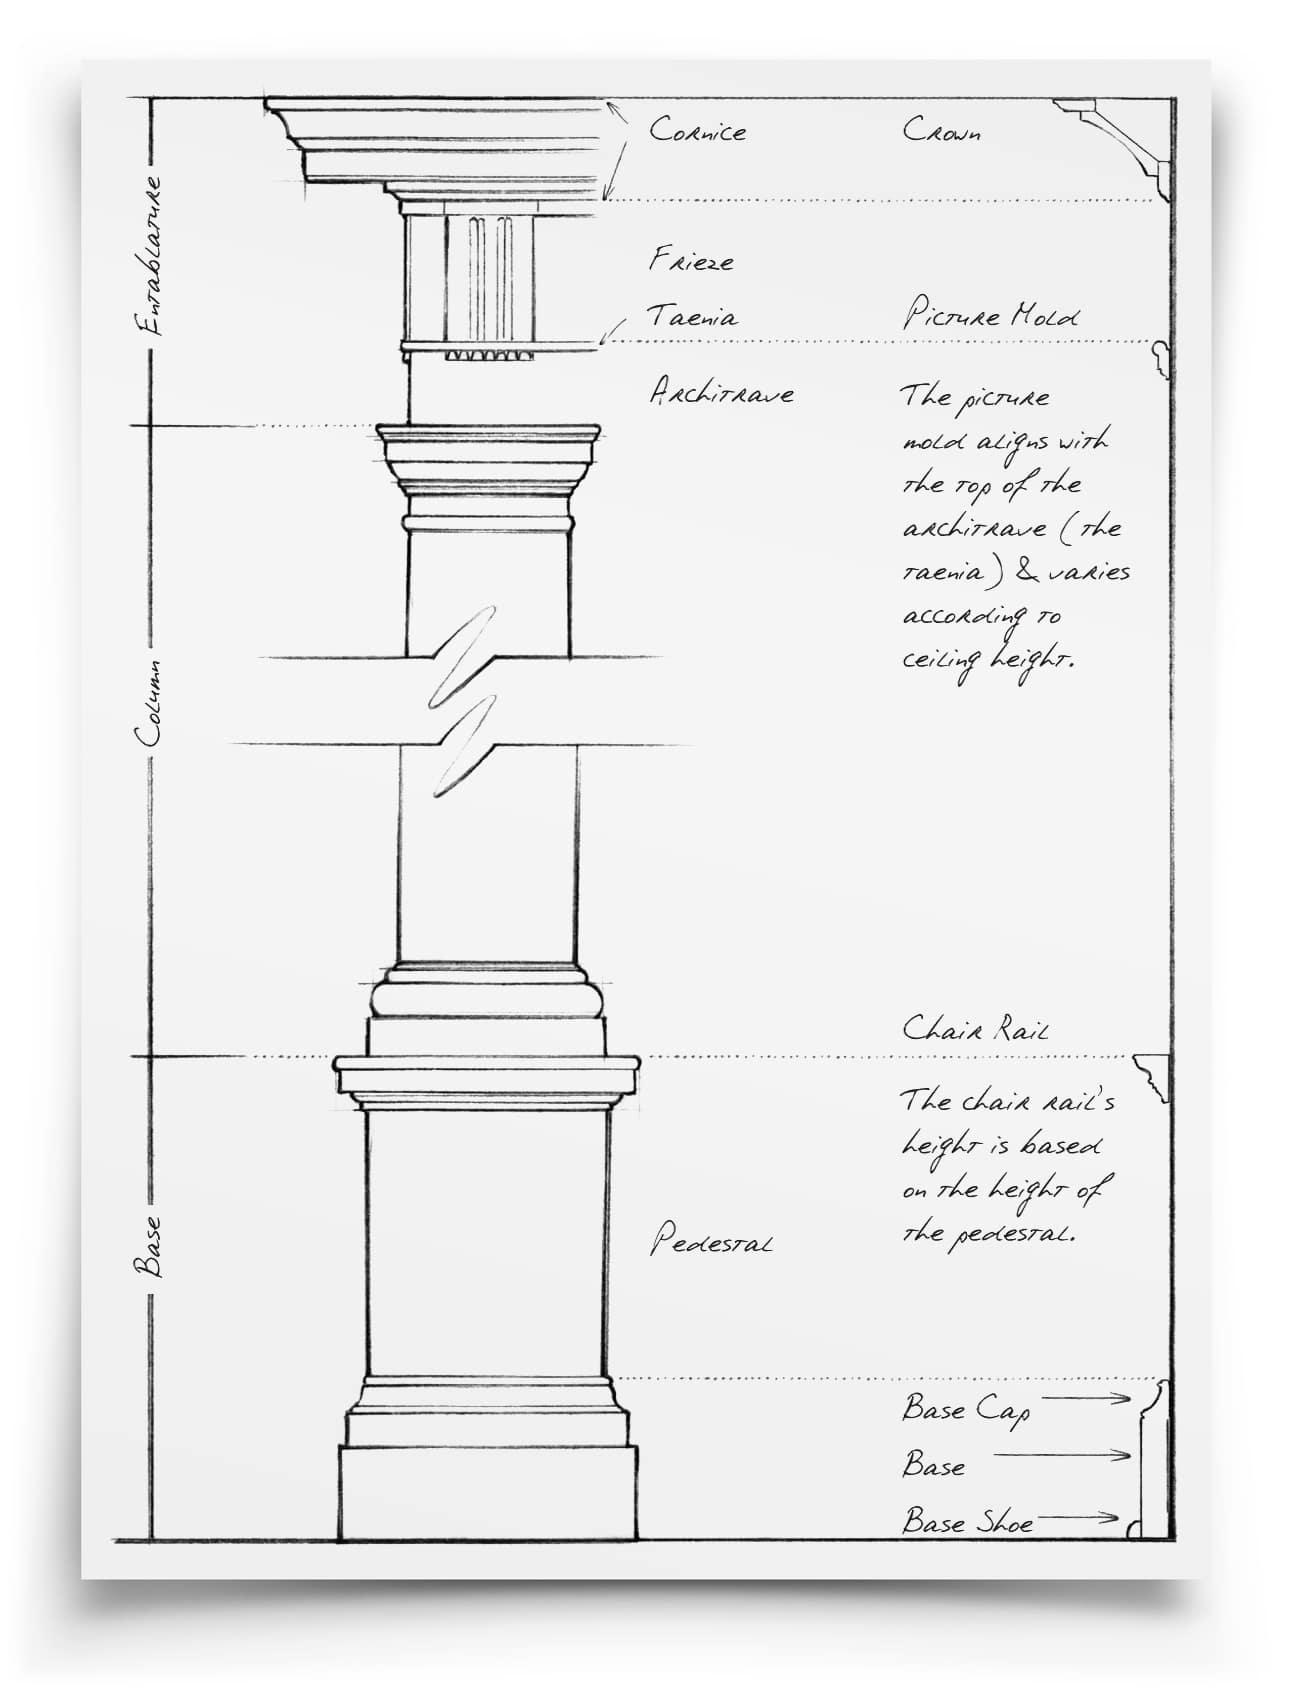 Brent Hull Designer Of Classical American Moldings